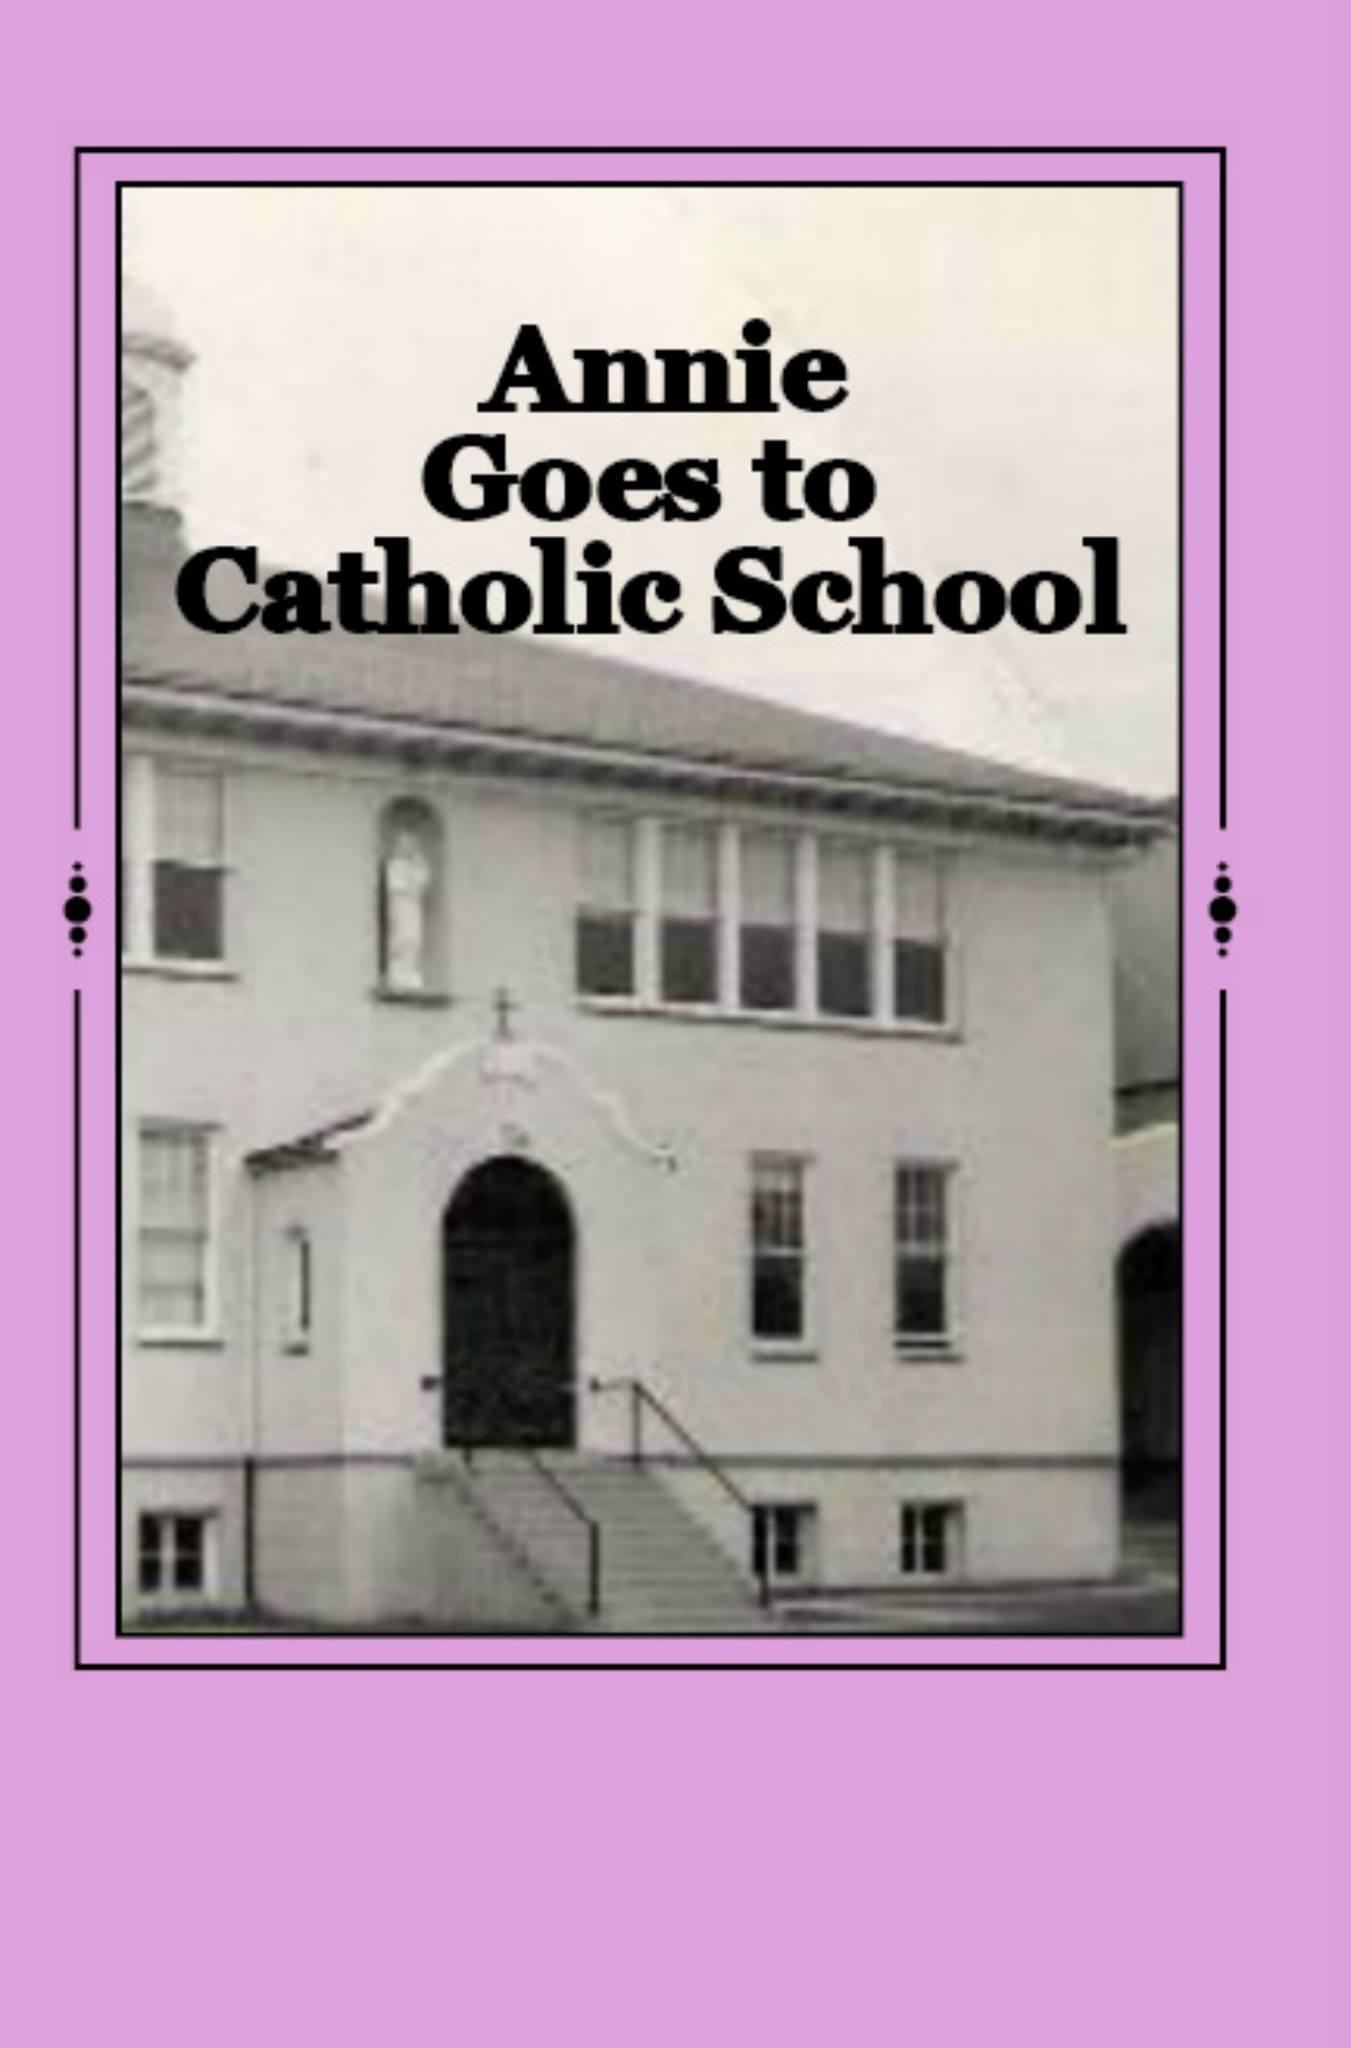 Annie Goes to Catholic School